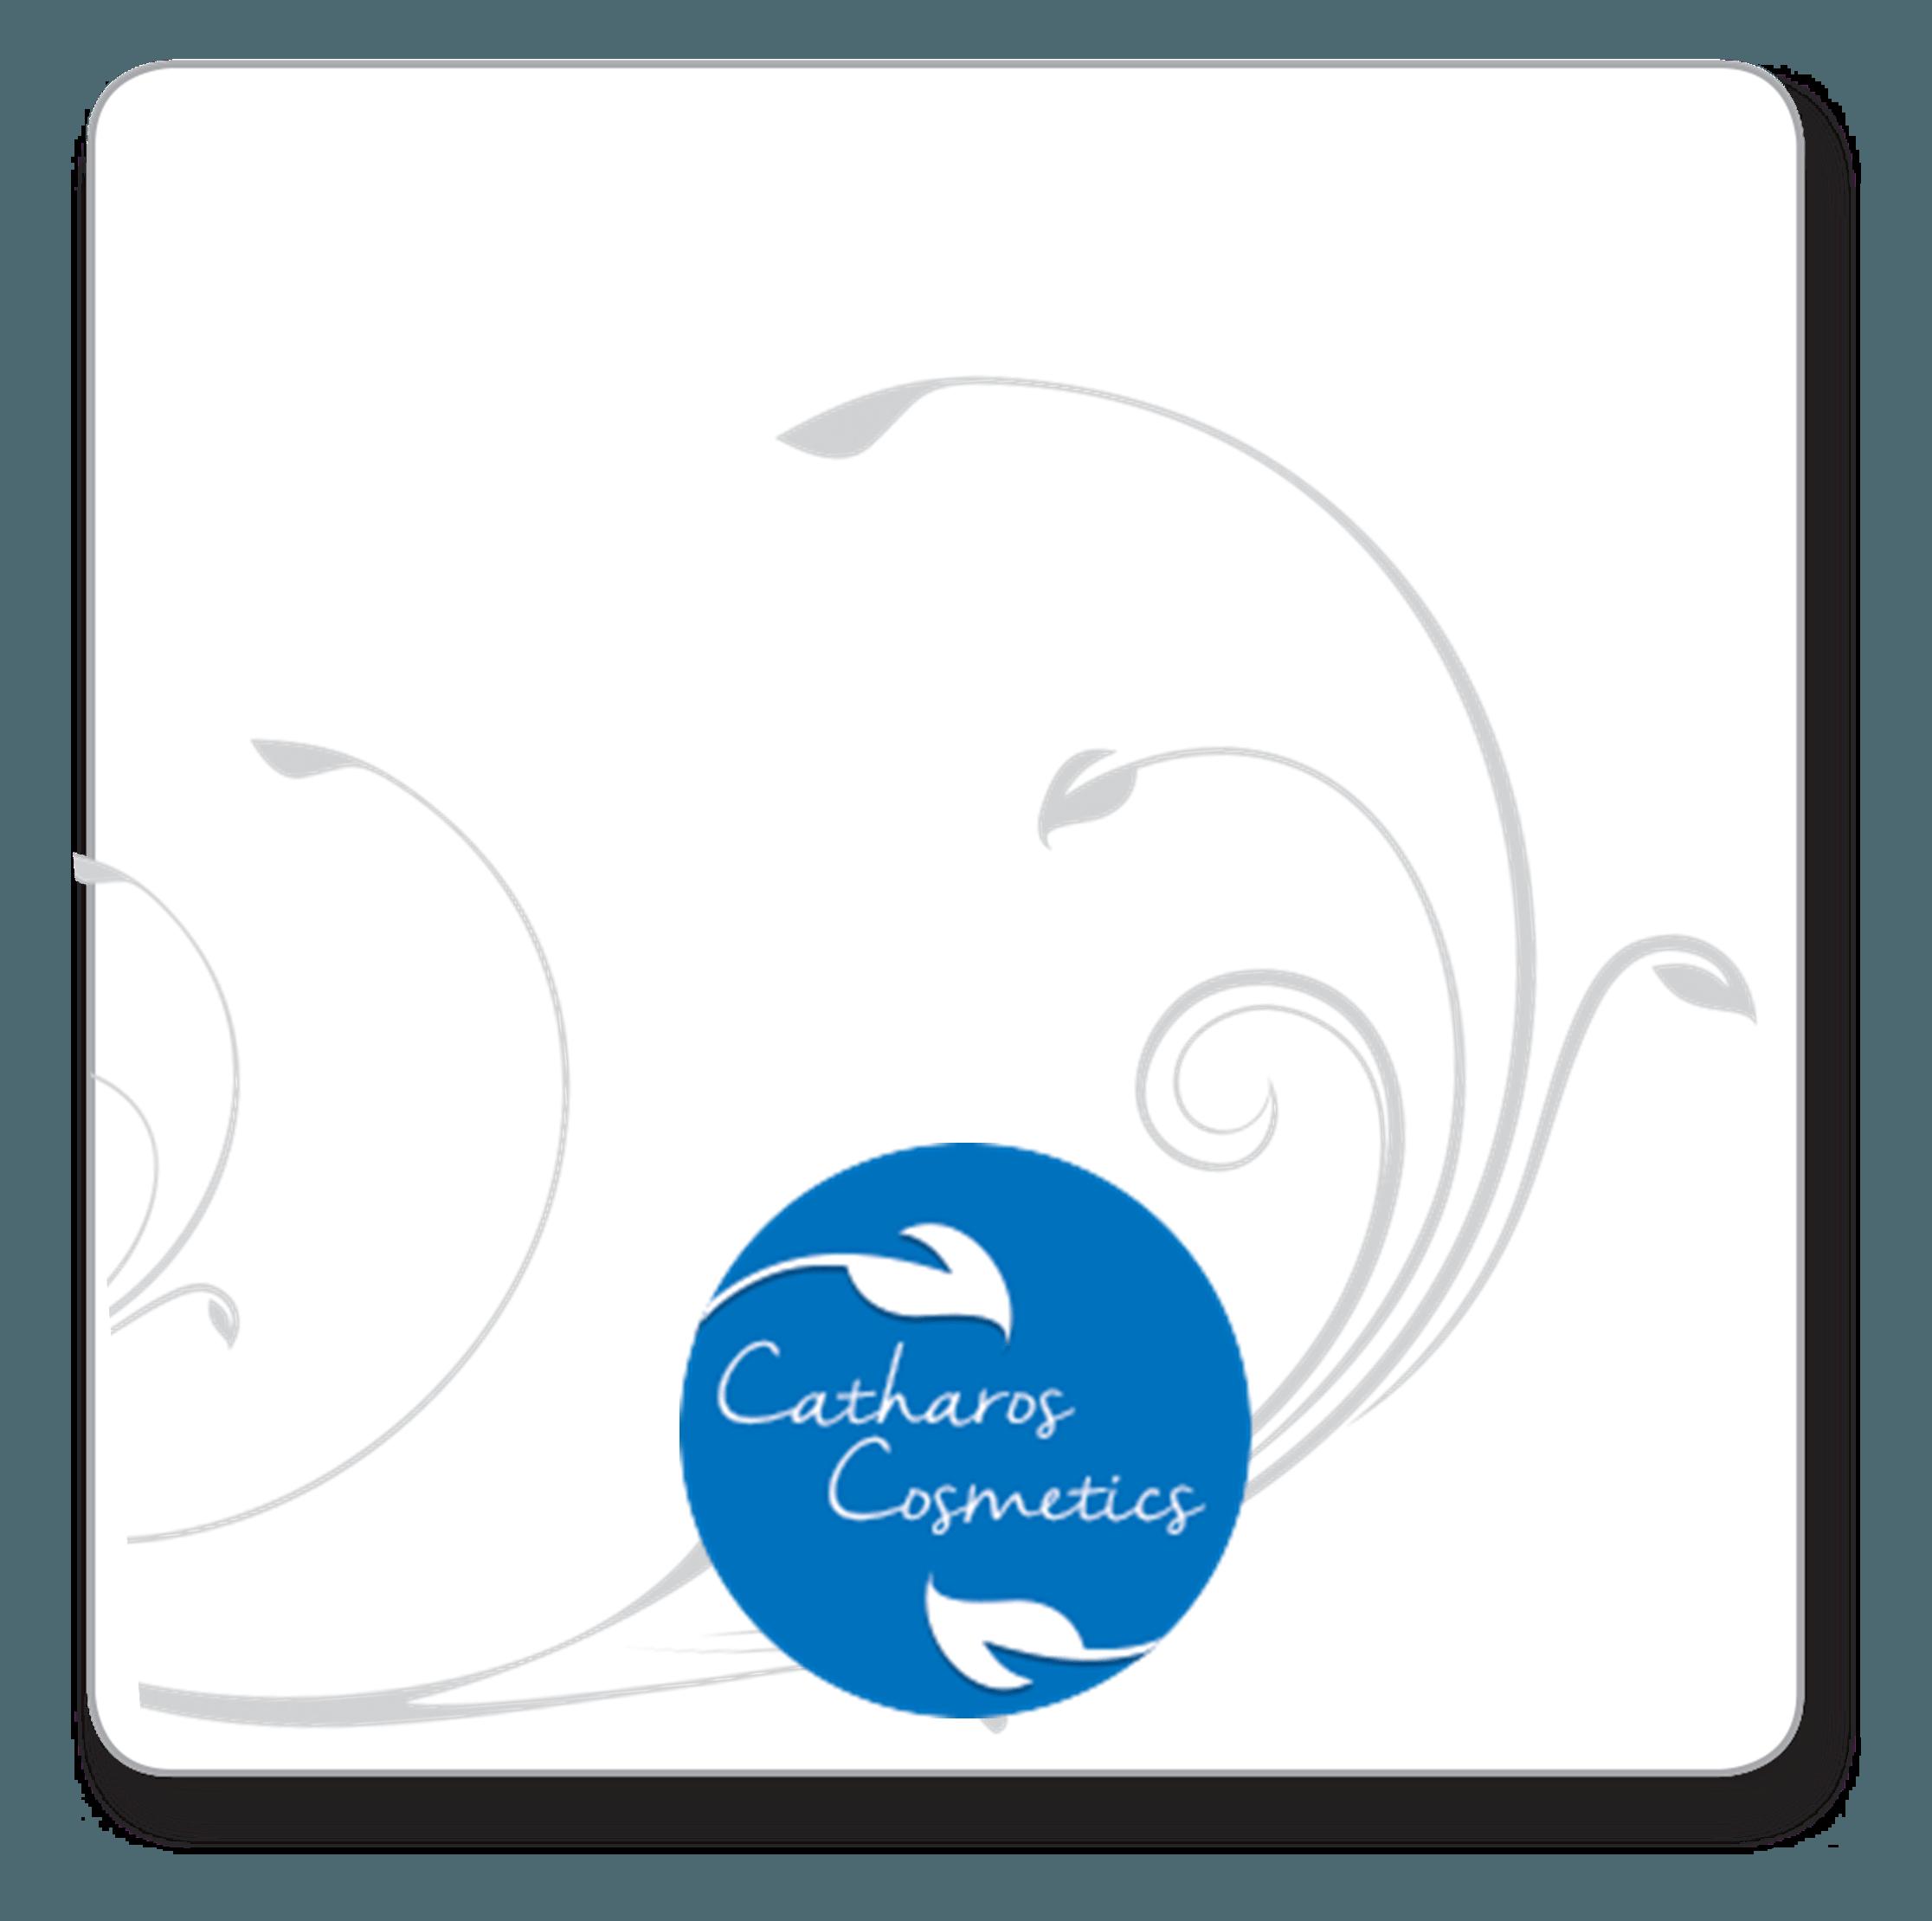 catharos cosmetics handverzorging